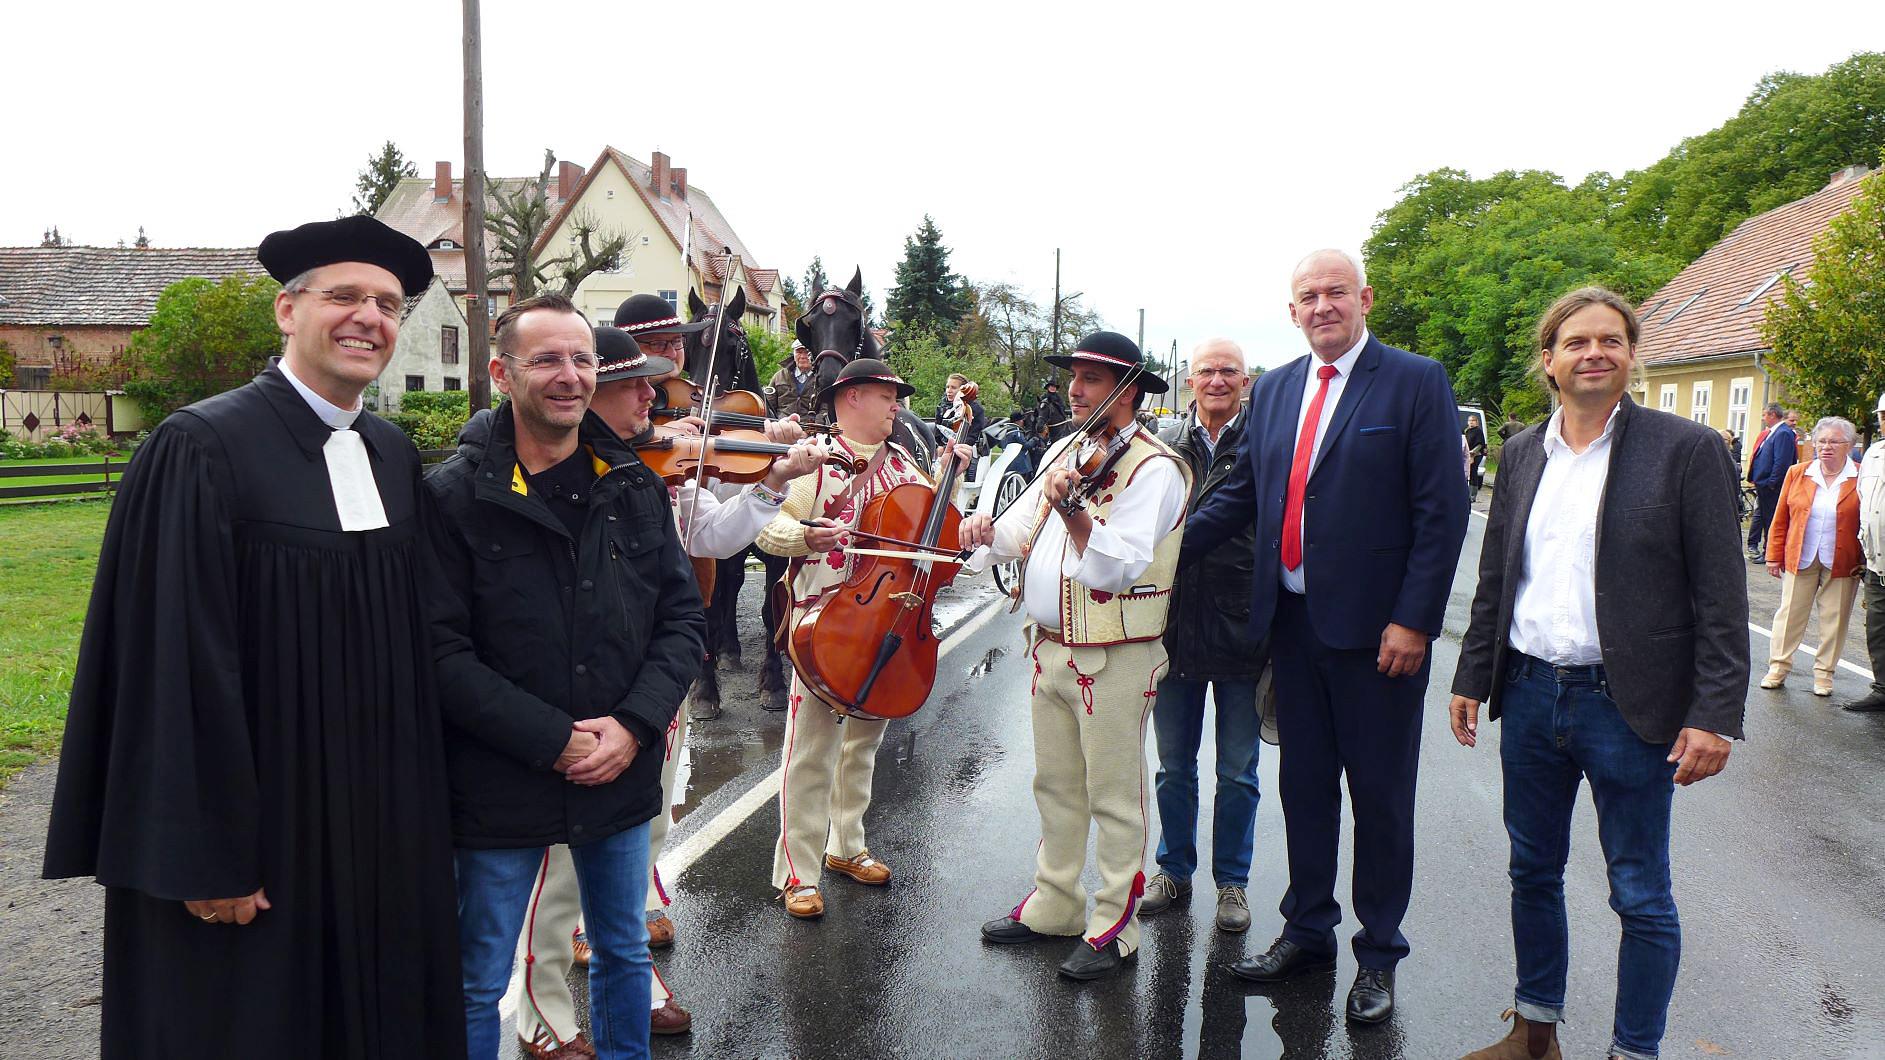 Erntedankumzug - Erntefest 2019 in Brück